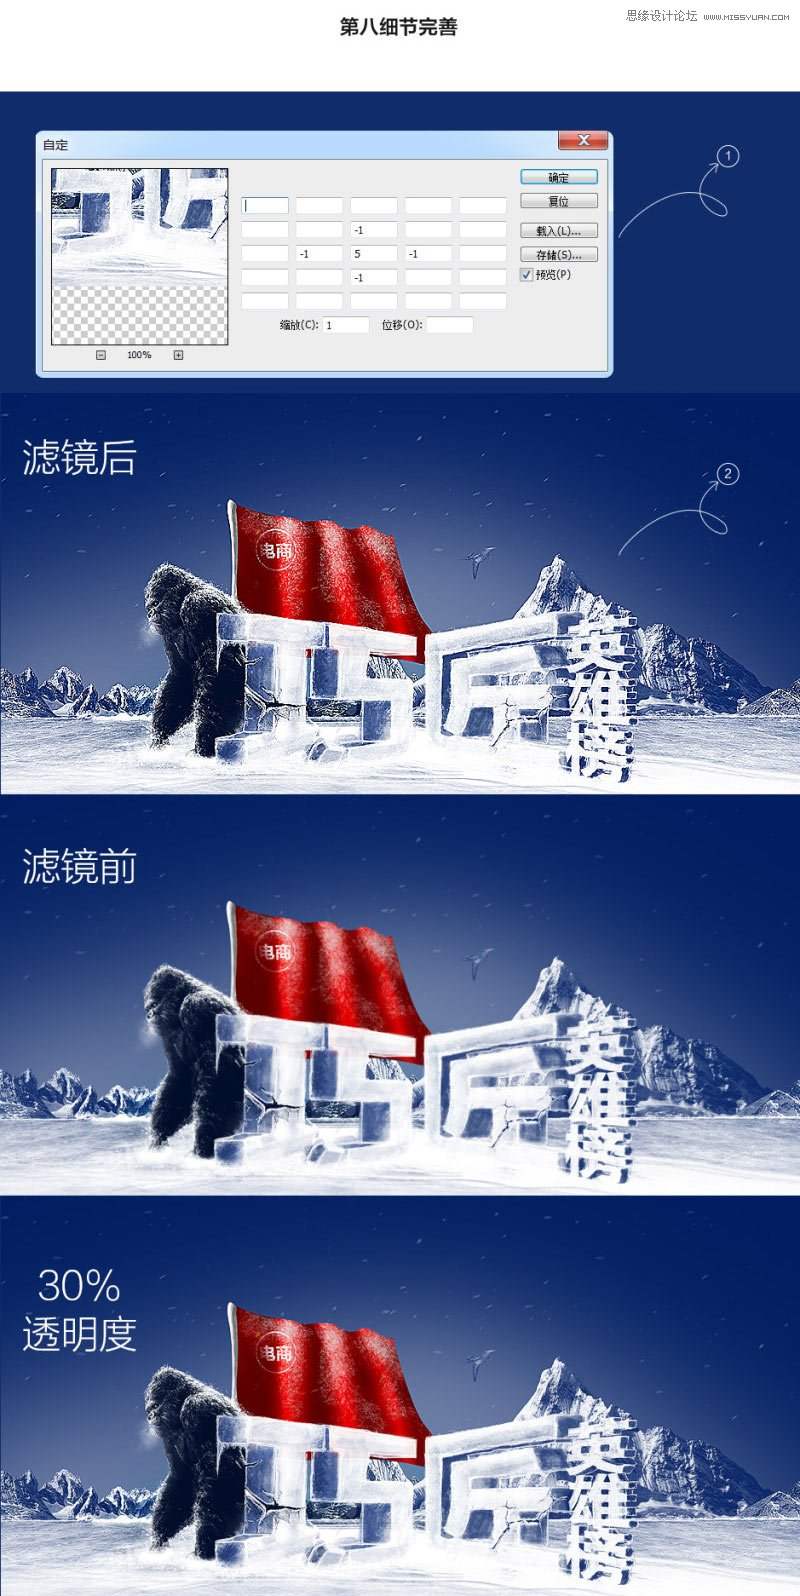 photoshop设计超酷的电商海报艺术字(4)